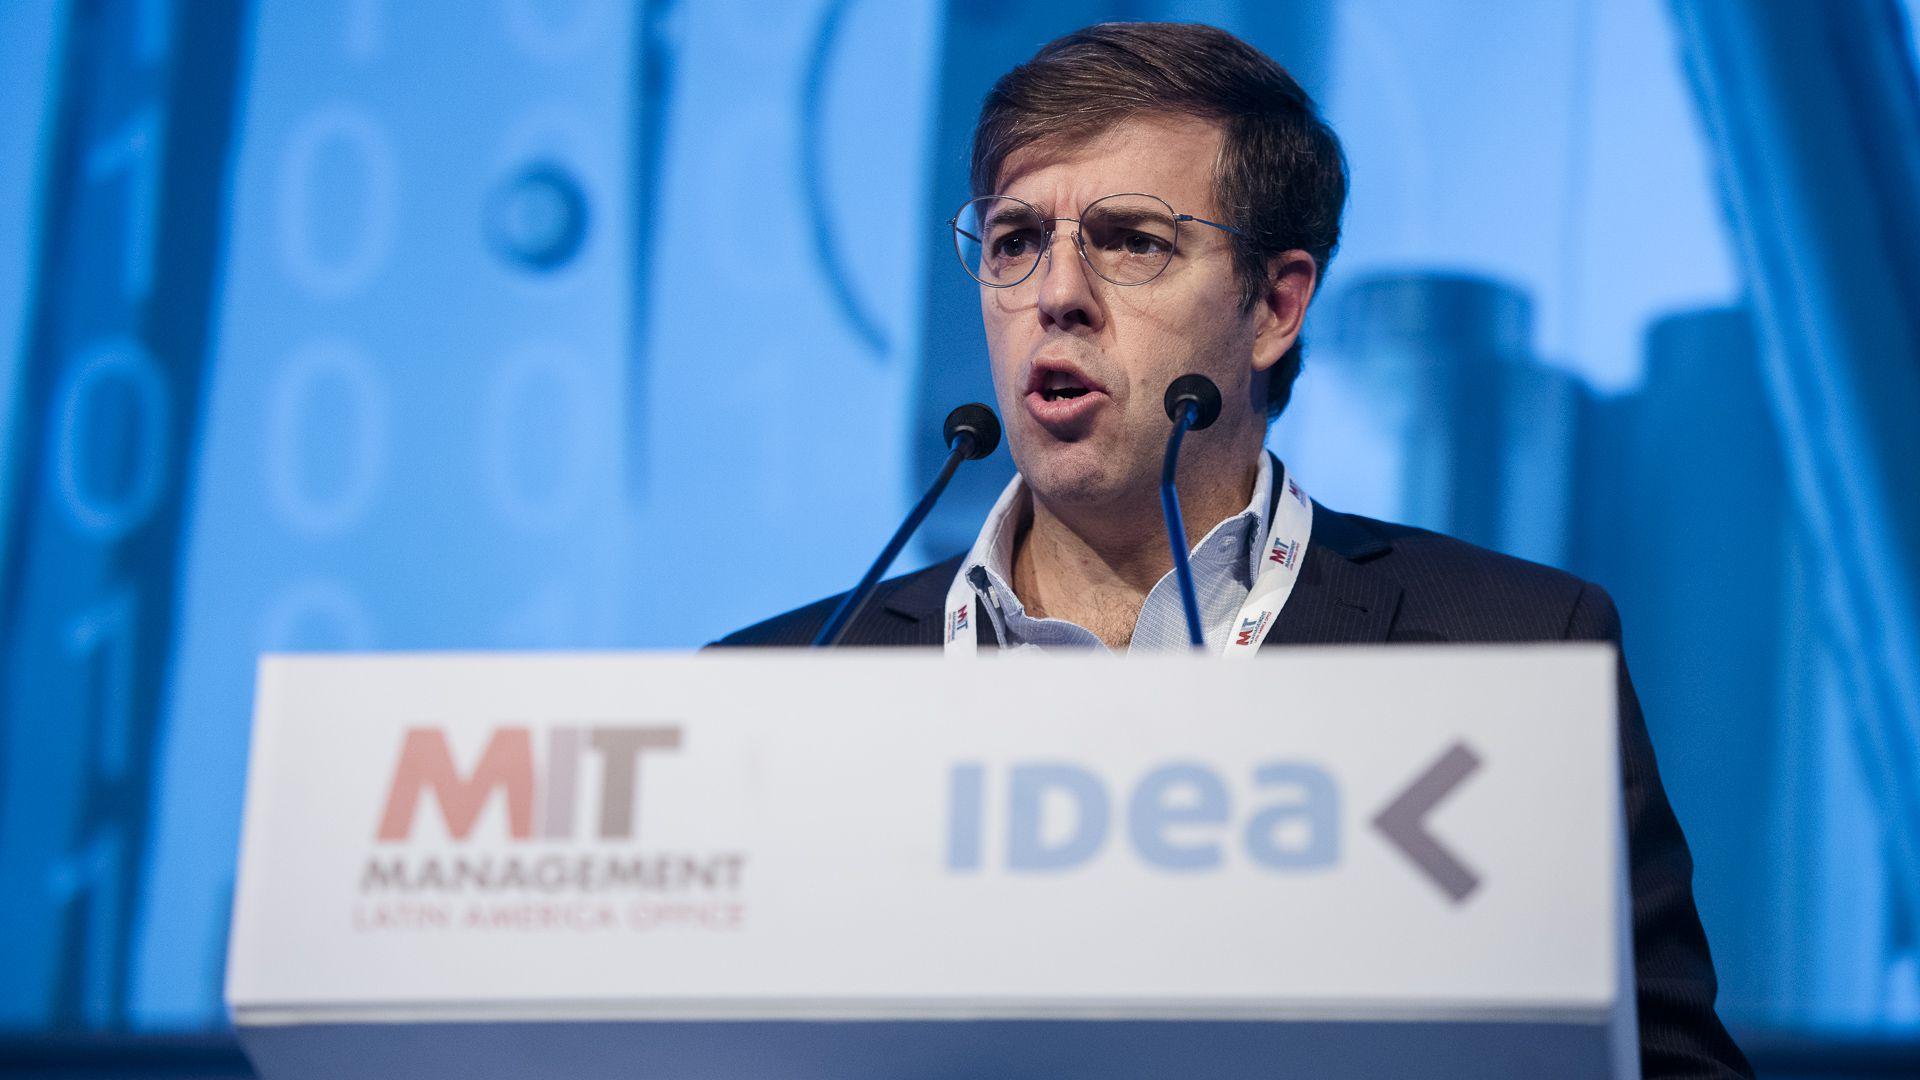 Javier Goñi, CEO de Ledesma (Adrián Escandar)